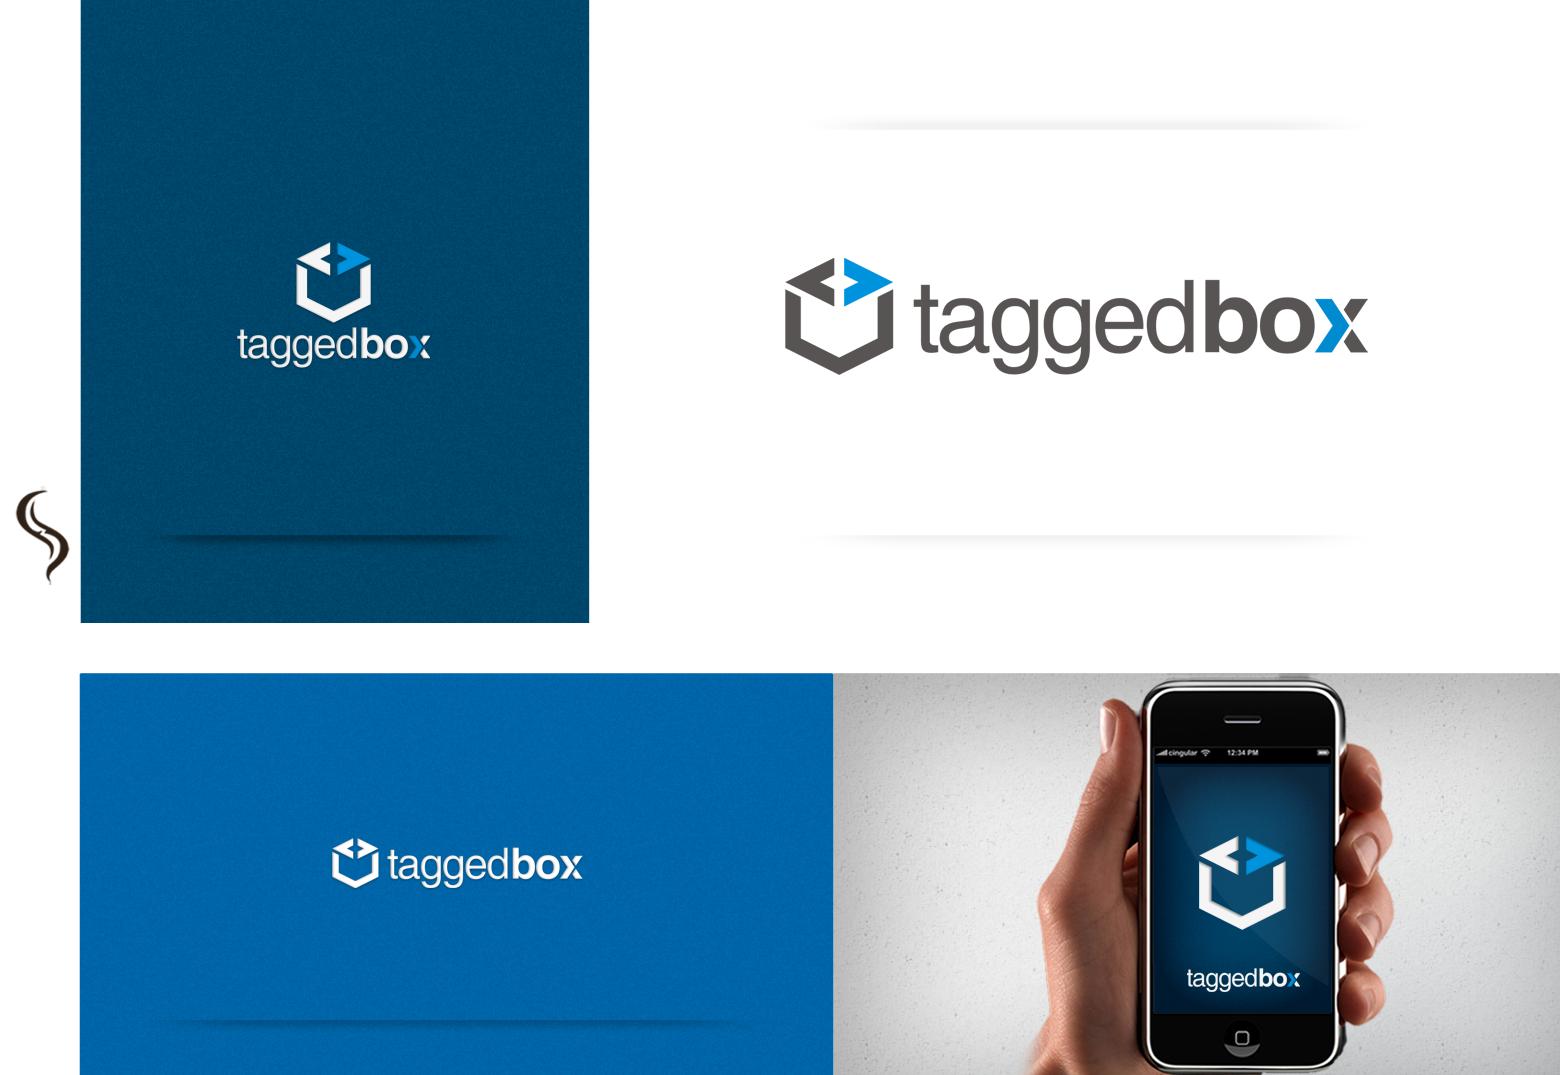 taggedBox needs a new logo